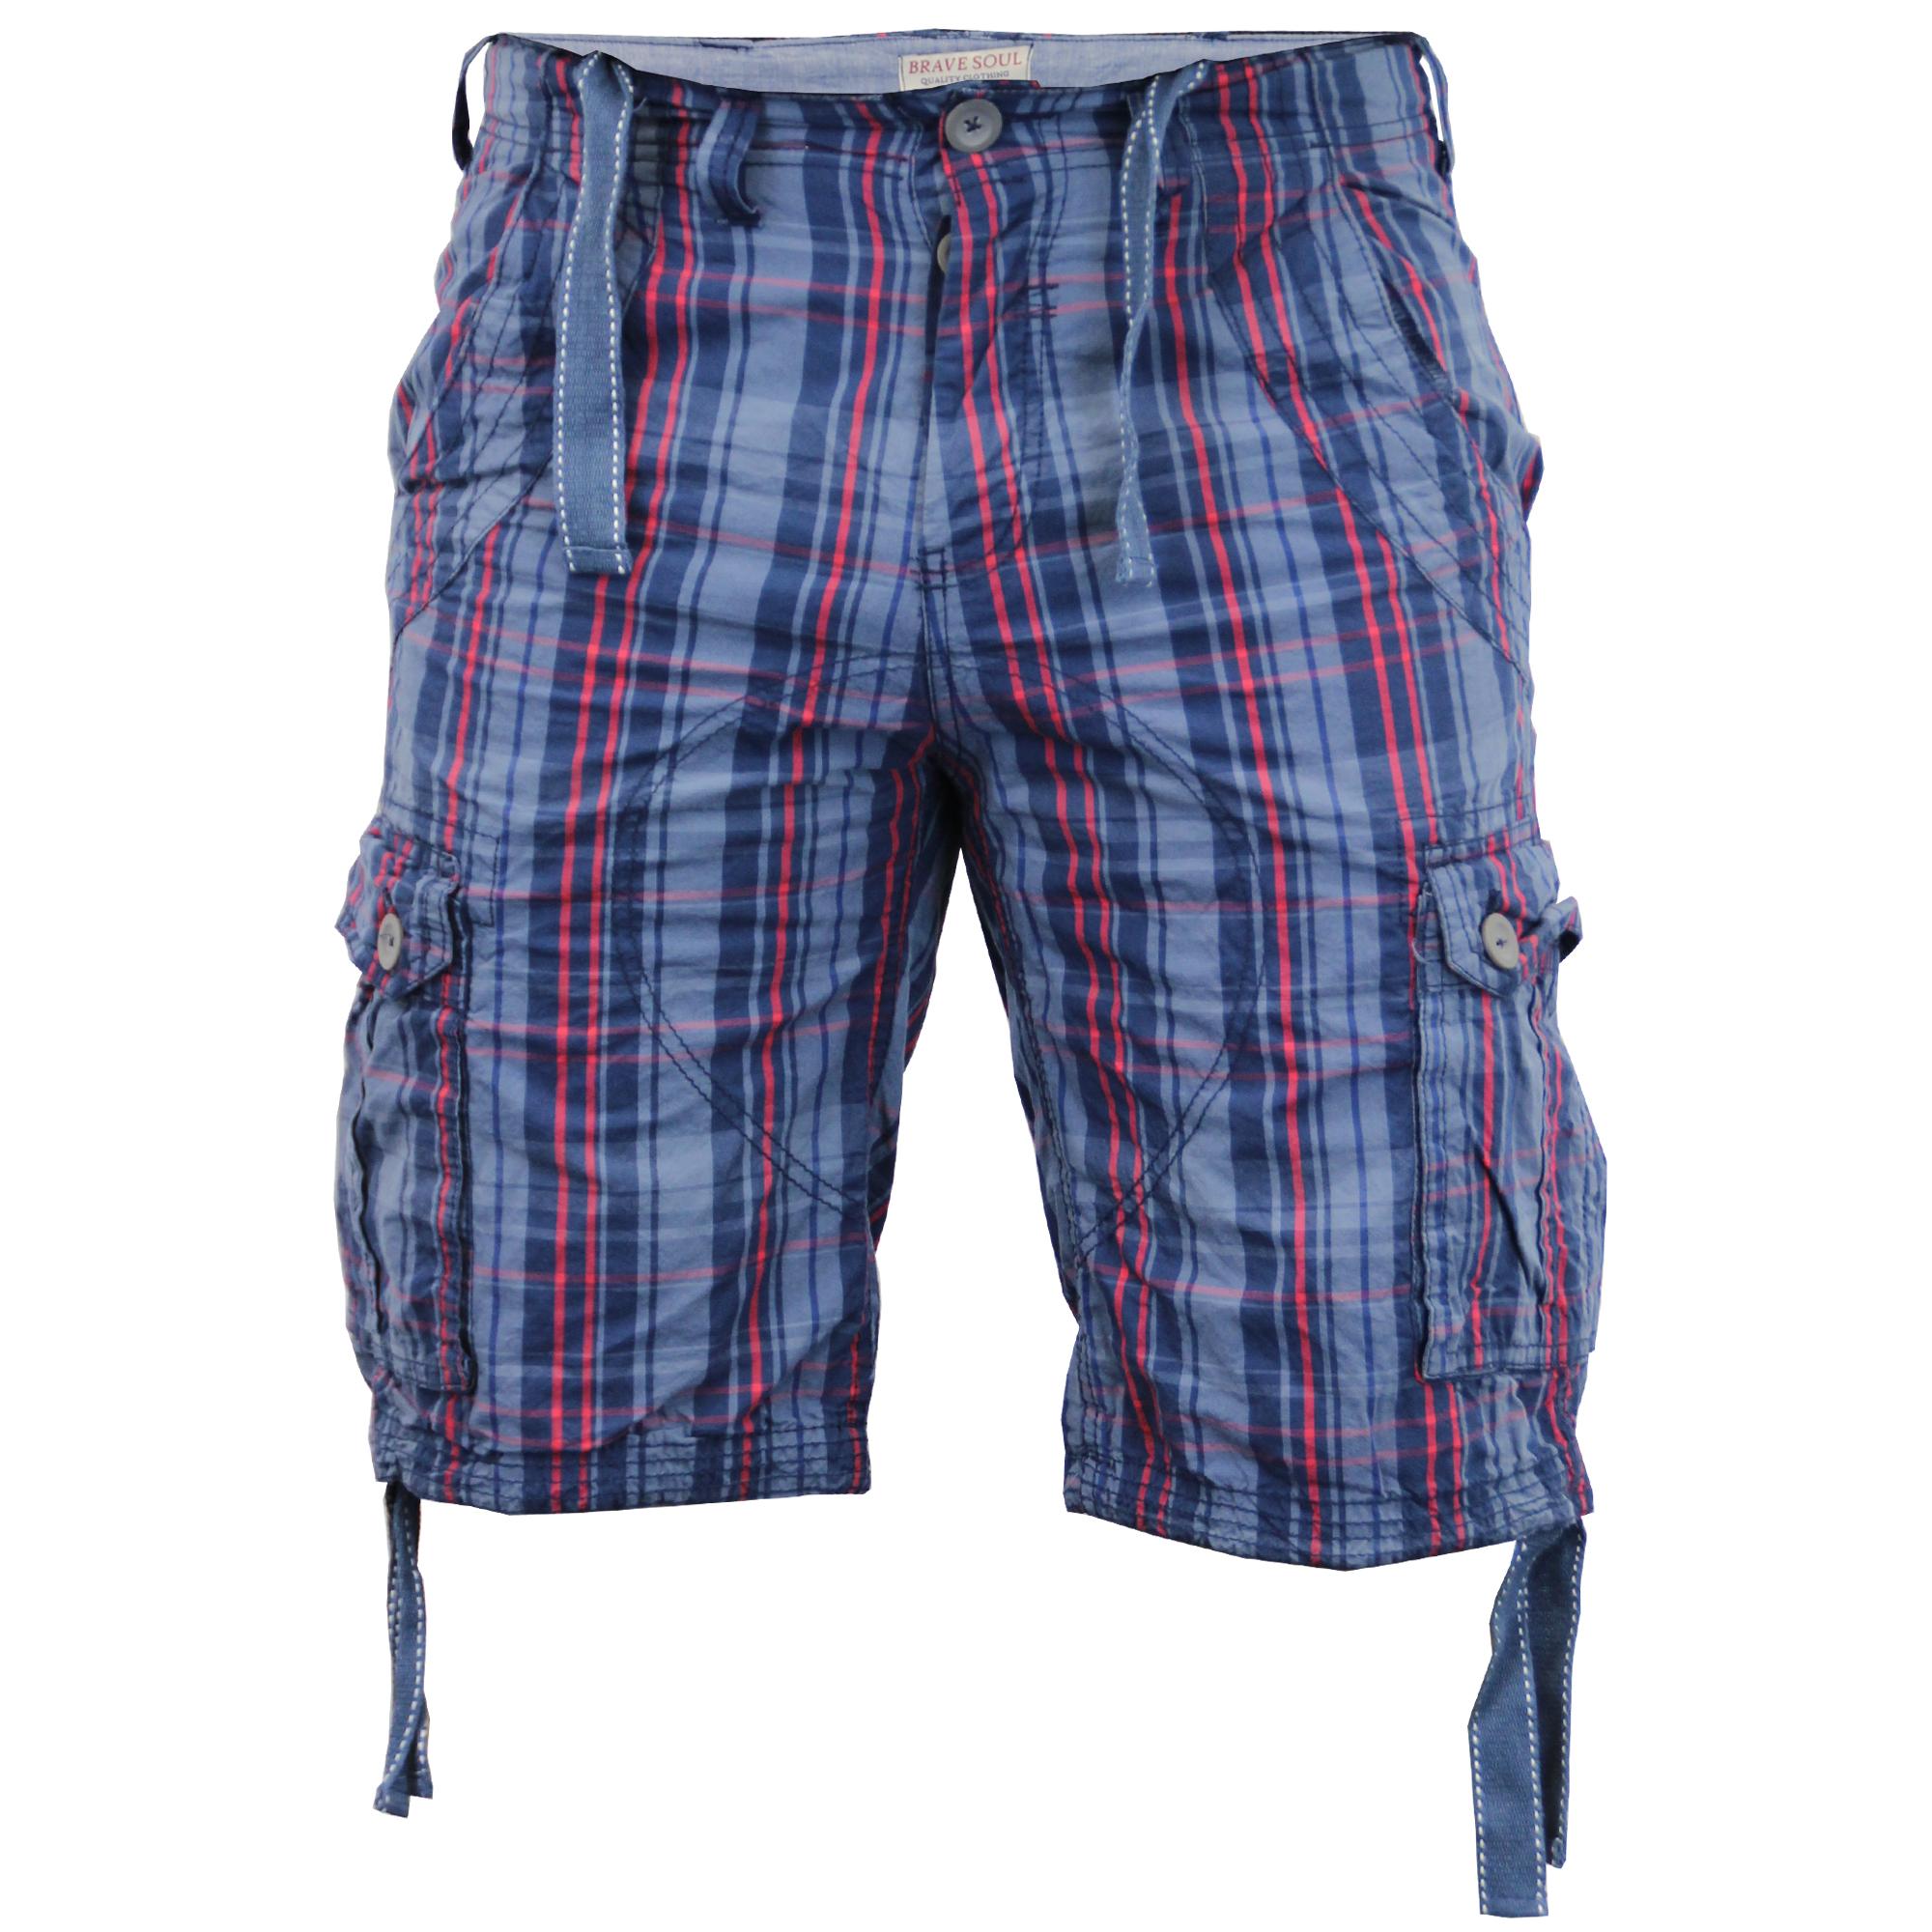 Mens Shorts Brave Soul Tartan Checked Combat Cargo Knee Length ...